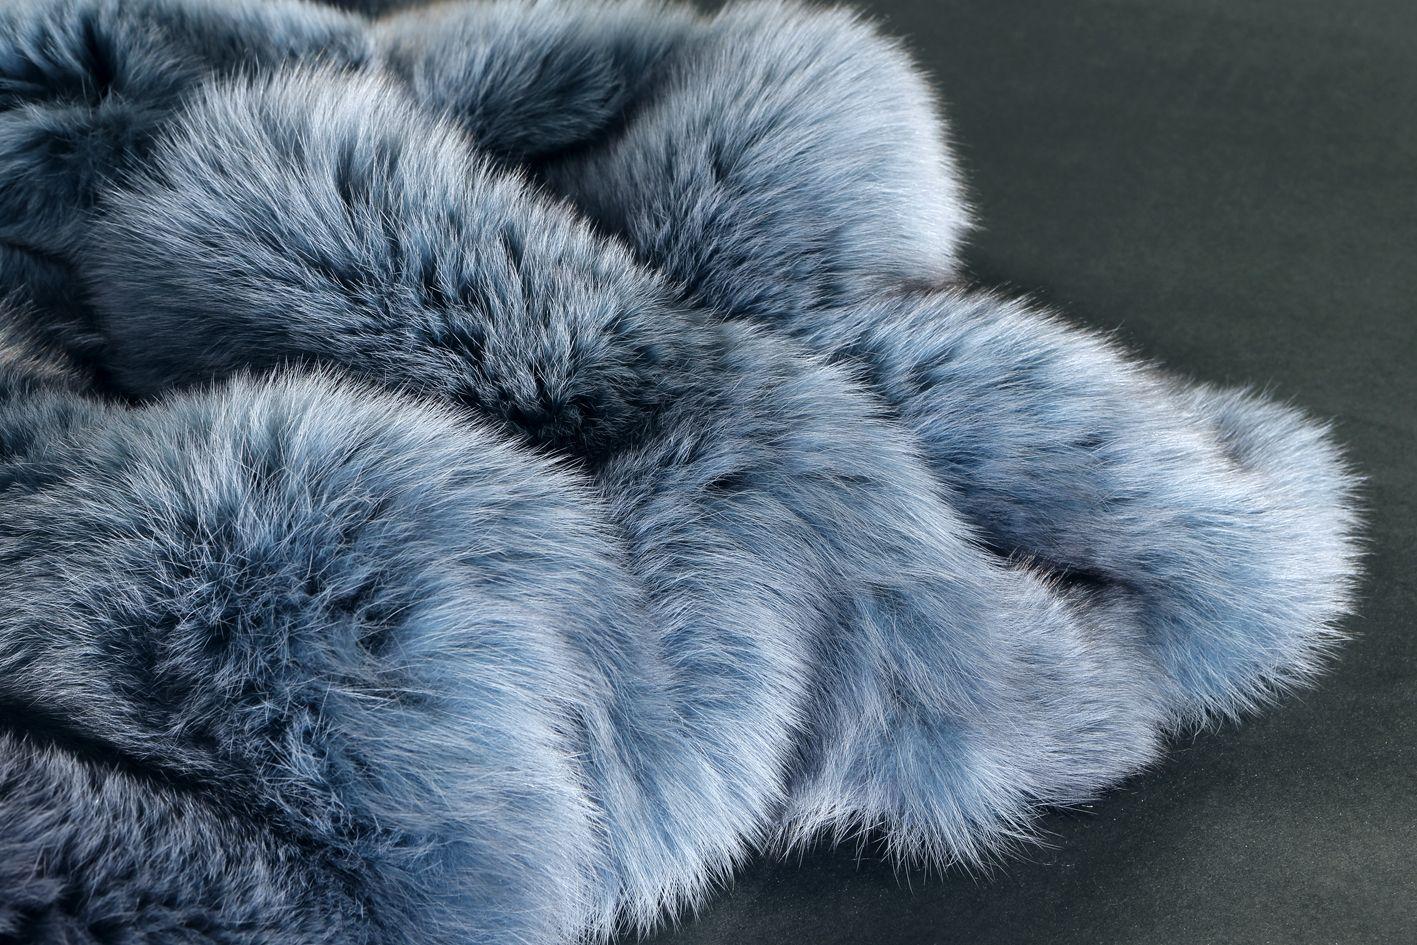 plaid renard arctique teint bleu dyed arctic fox throw. Black Bedroom Furniture Sets. Home Design Ideas